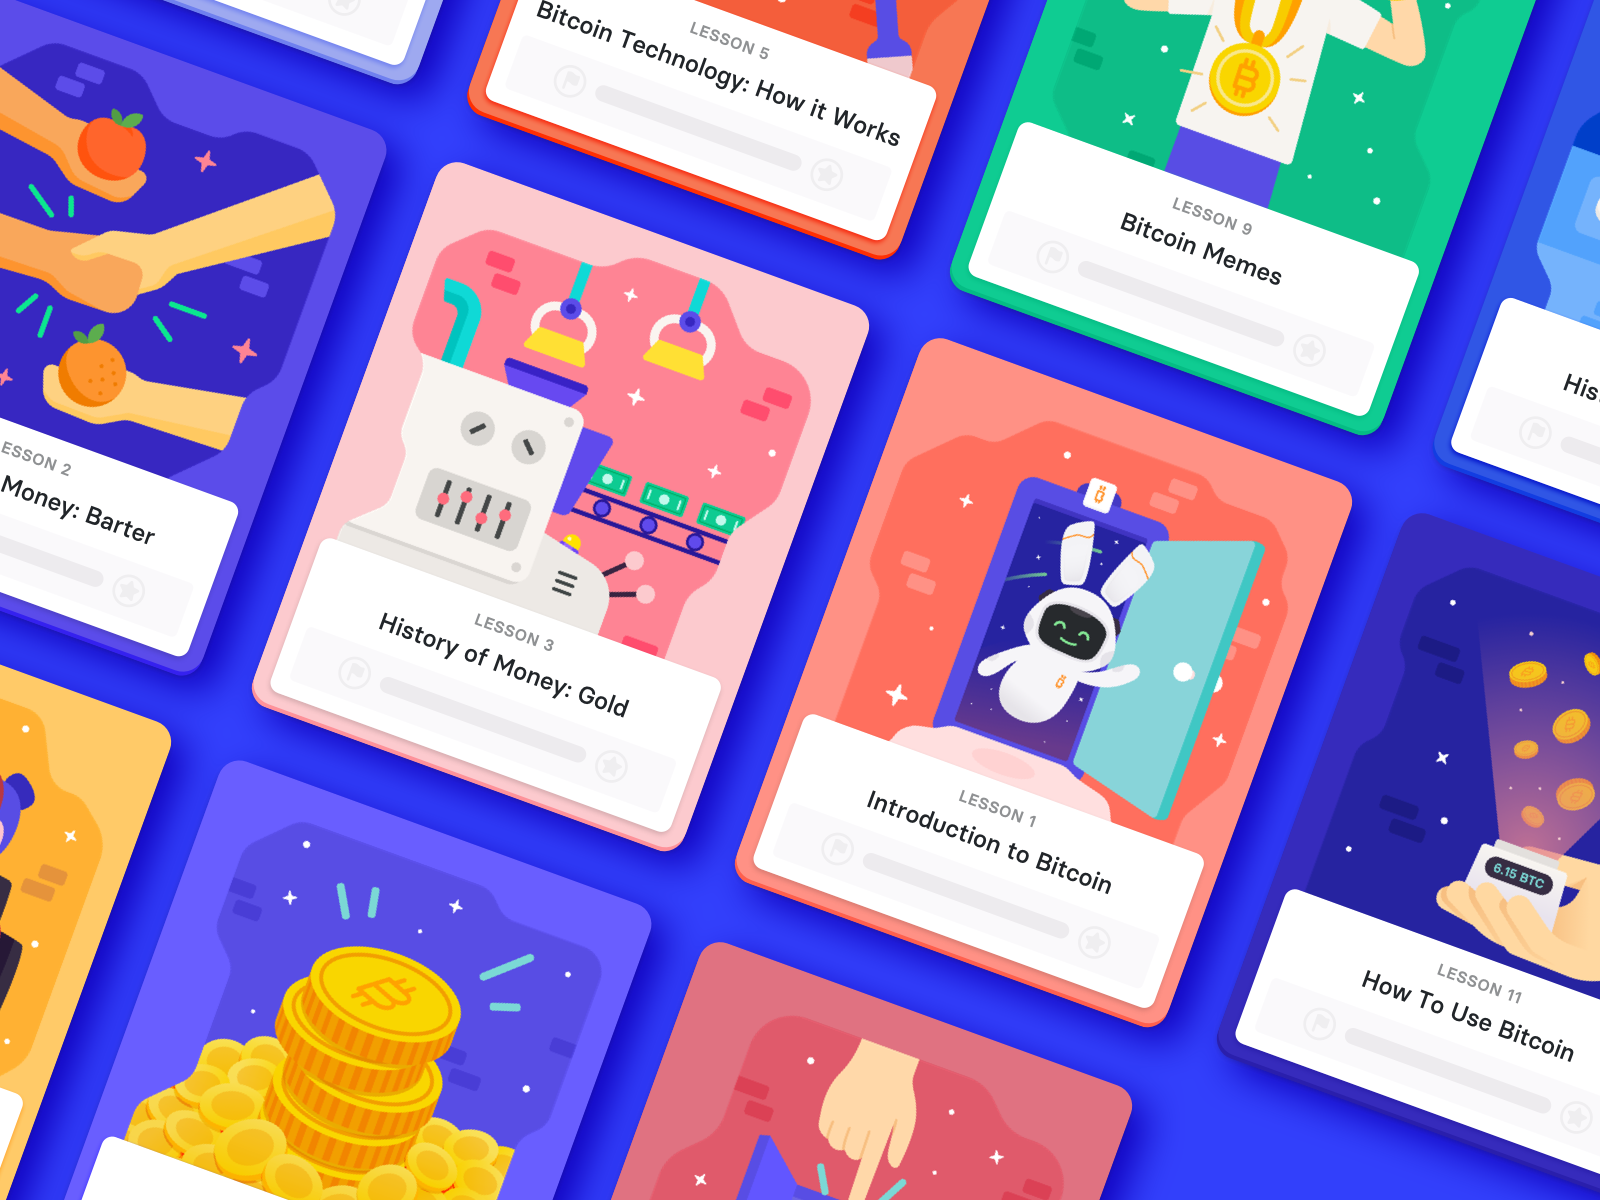 Creativity, craft, and Bitcoin